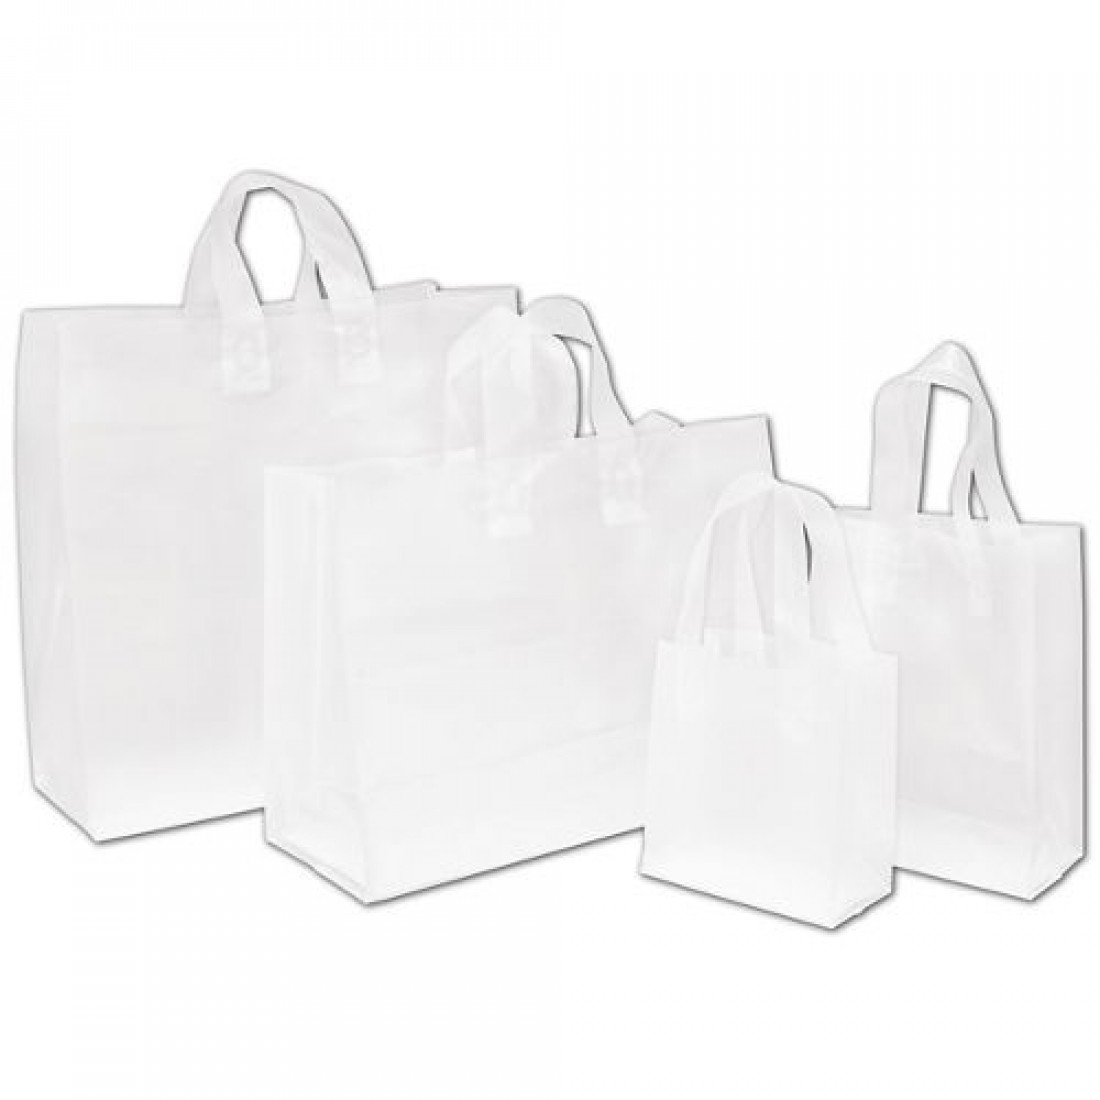 Clear Frstd HiDen Merch Bag